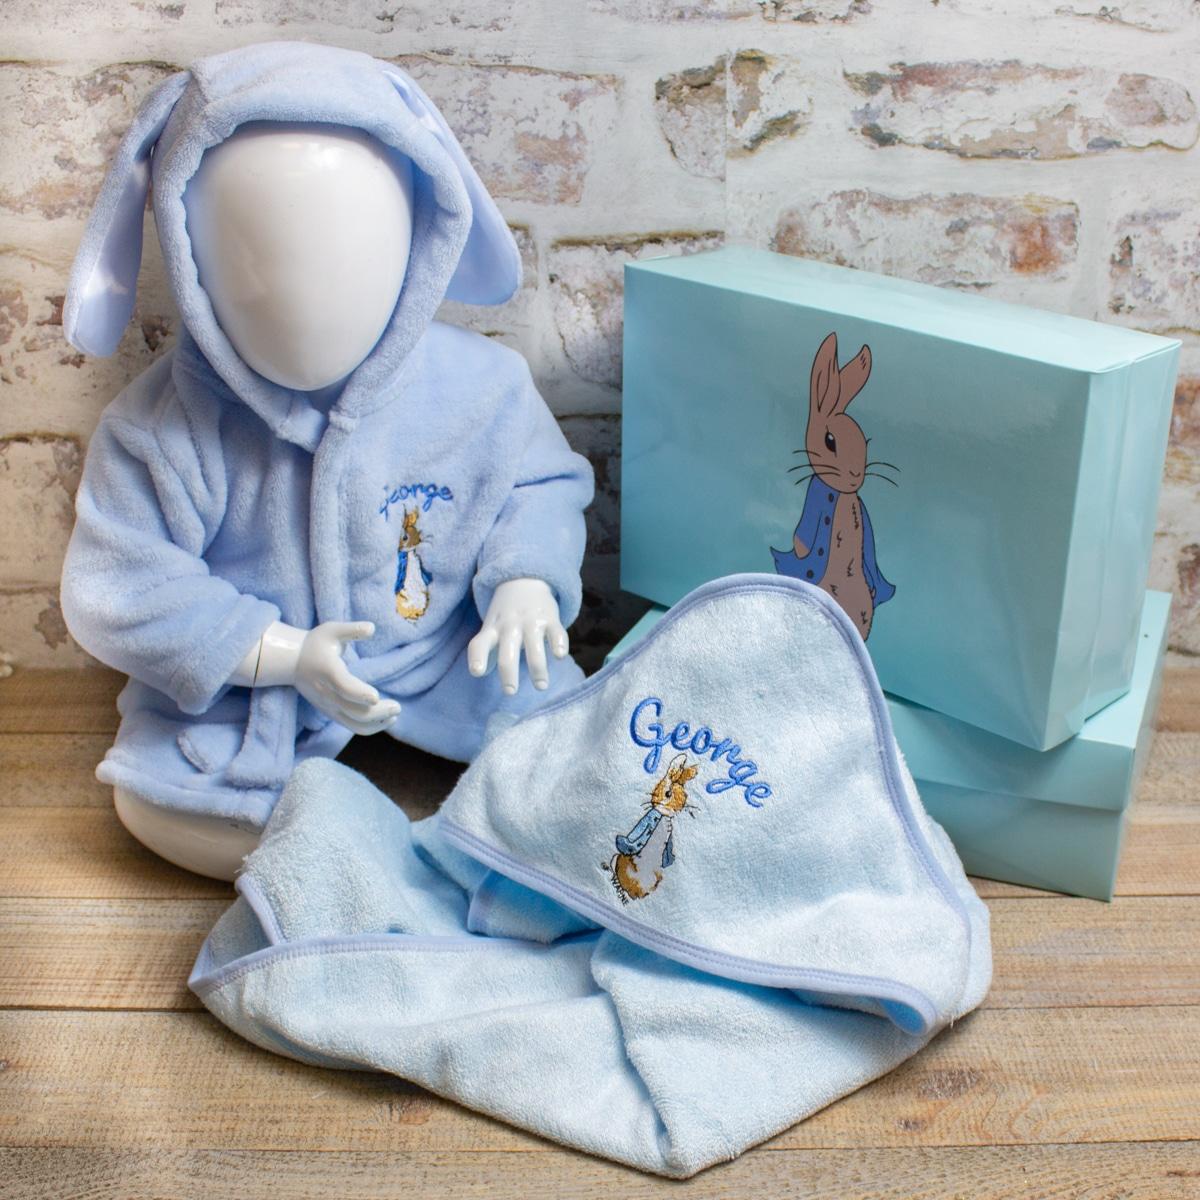 Personalised Peter Rabbit Baby Gift Set